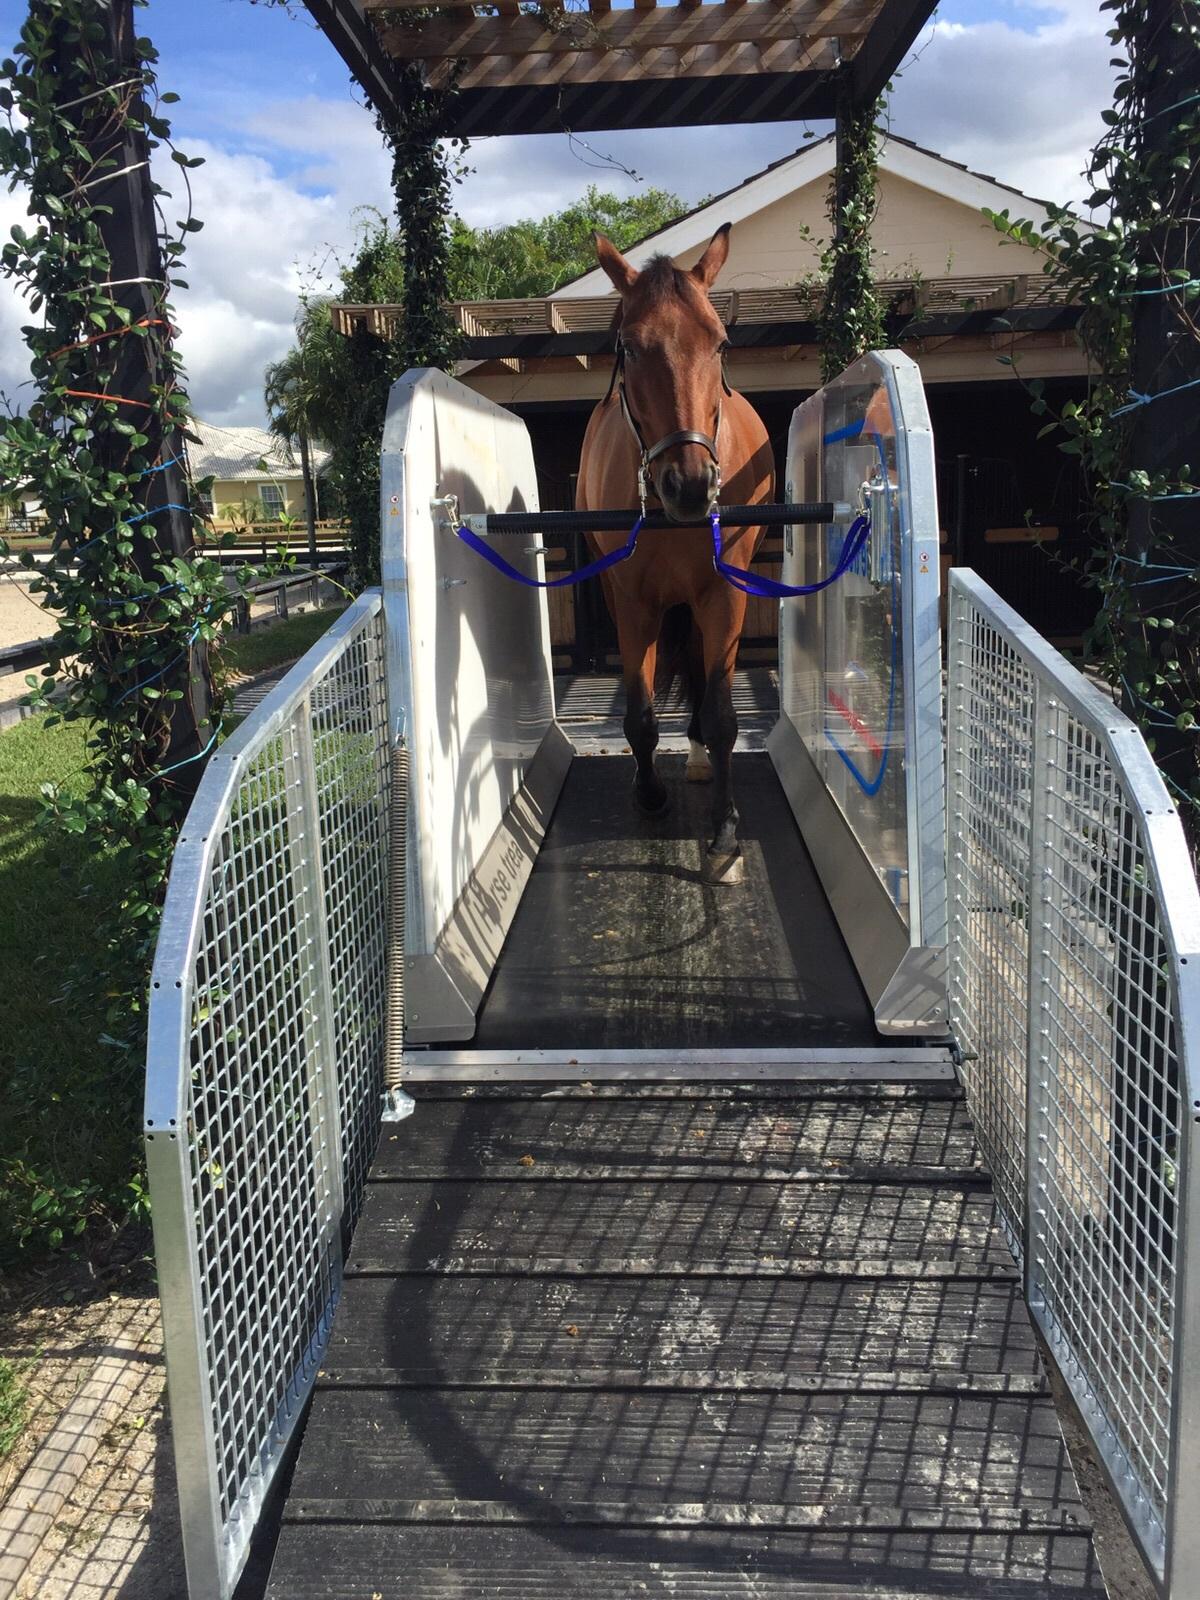 Horse Treadmill at Juan Ortiz Stable, FL